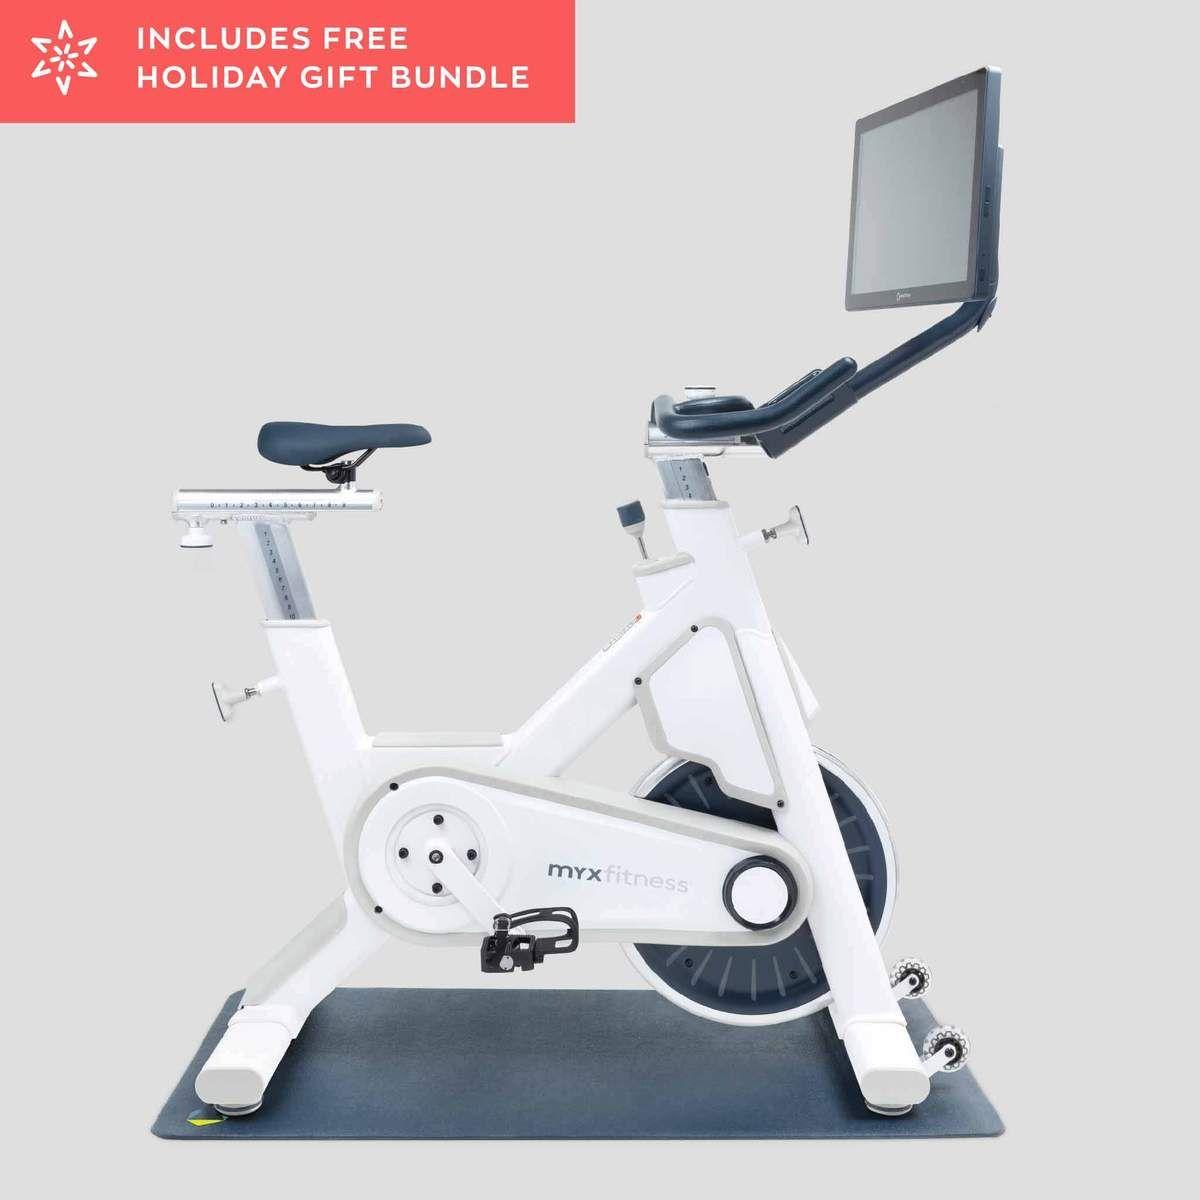 The Myx Biking Workout Best Exercise Bike Fun Workouts